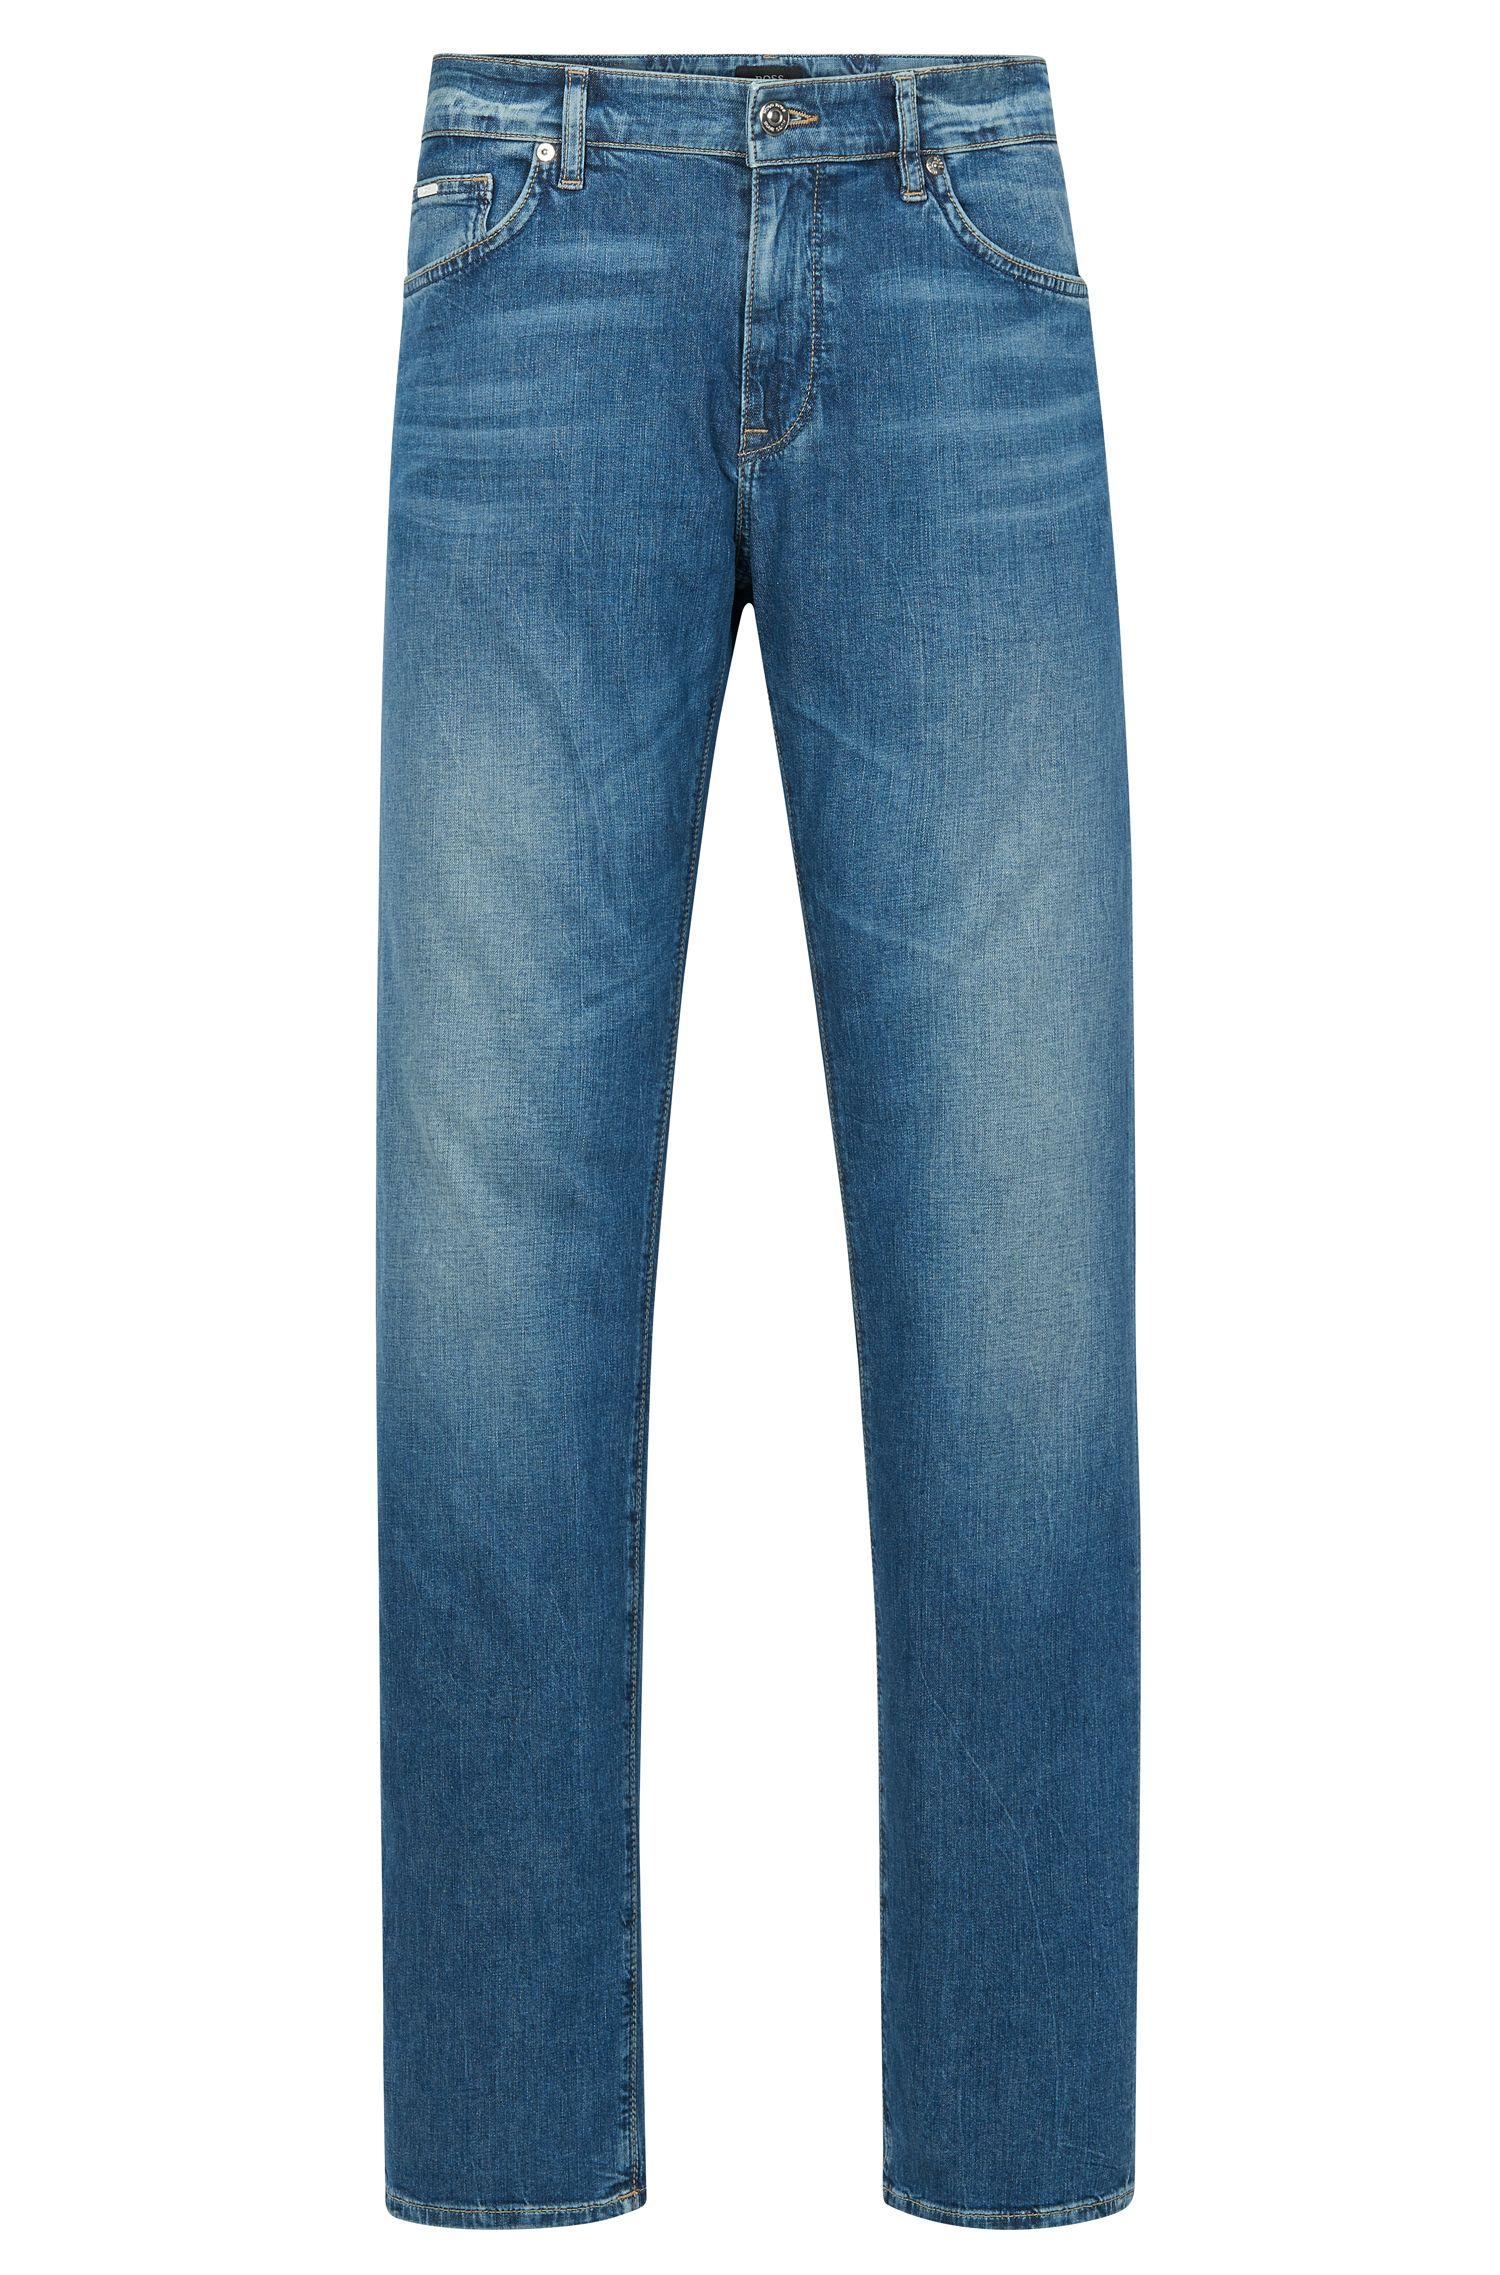 9 oz Stretch Cotton Jean, Regular Fit | Maine